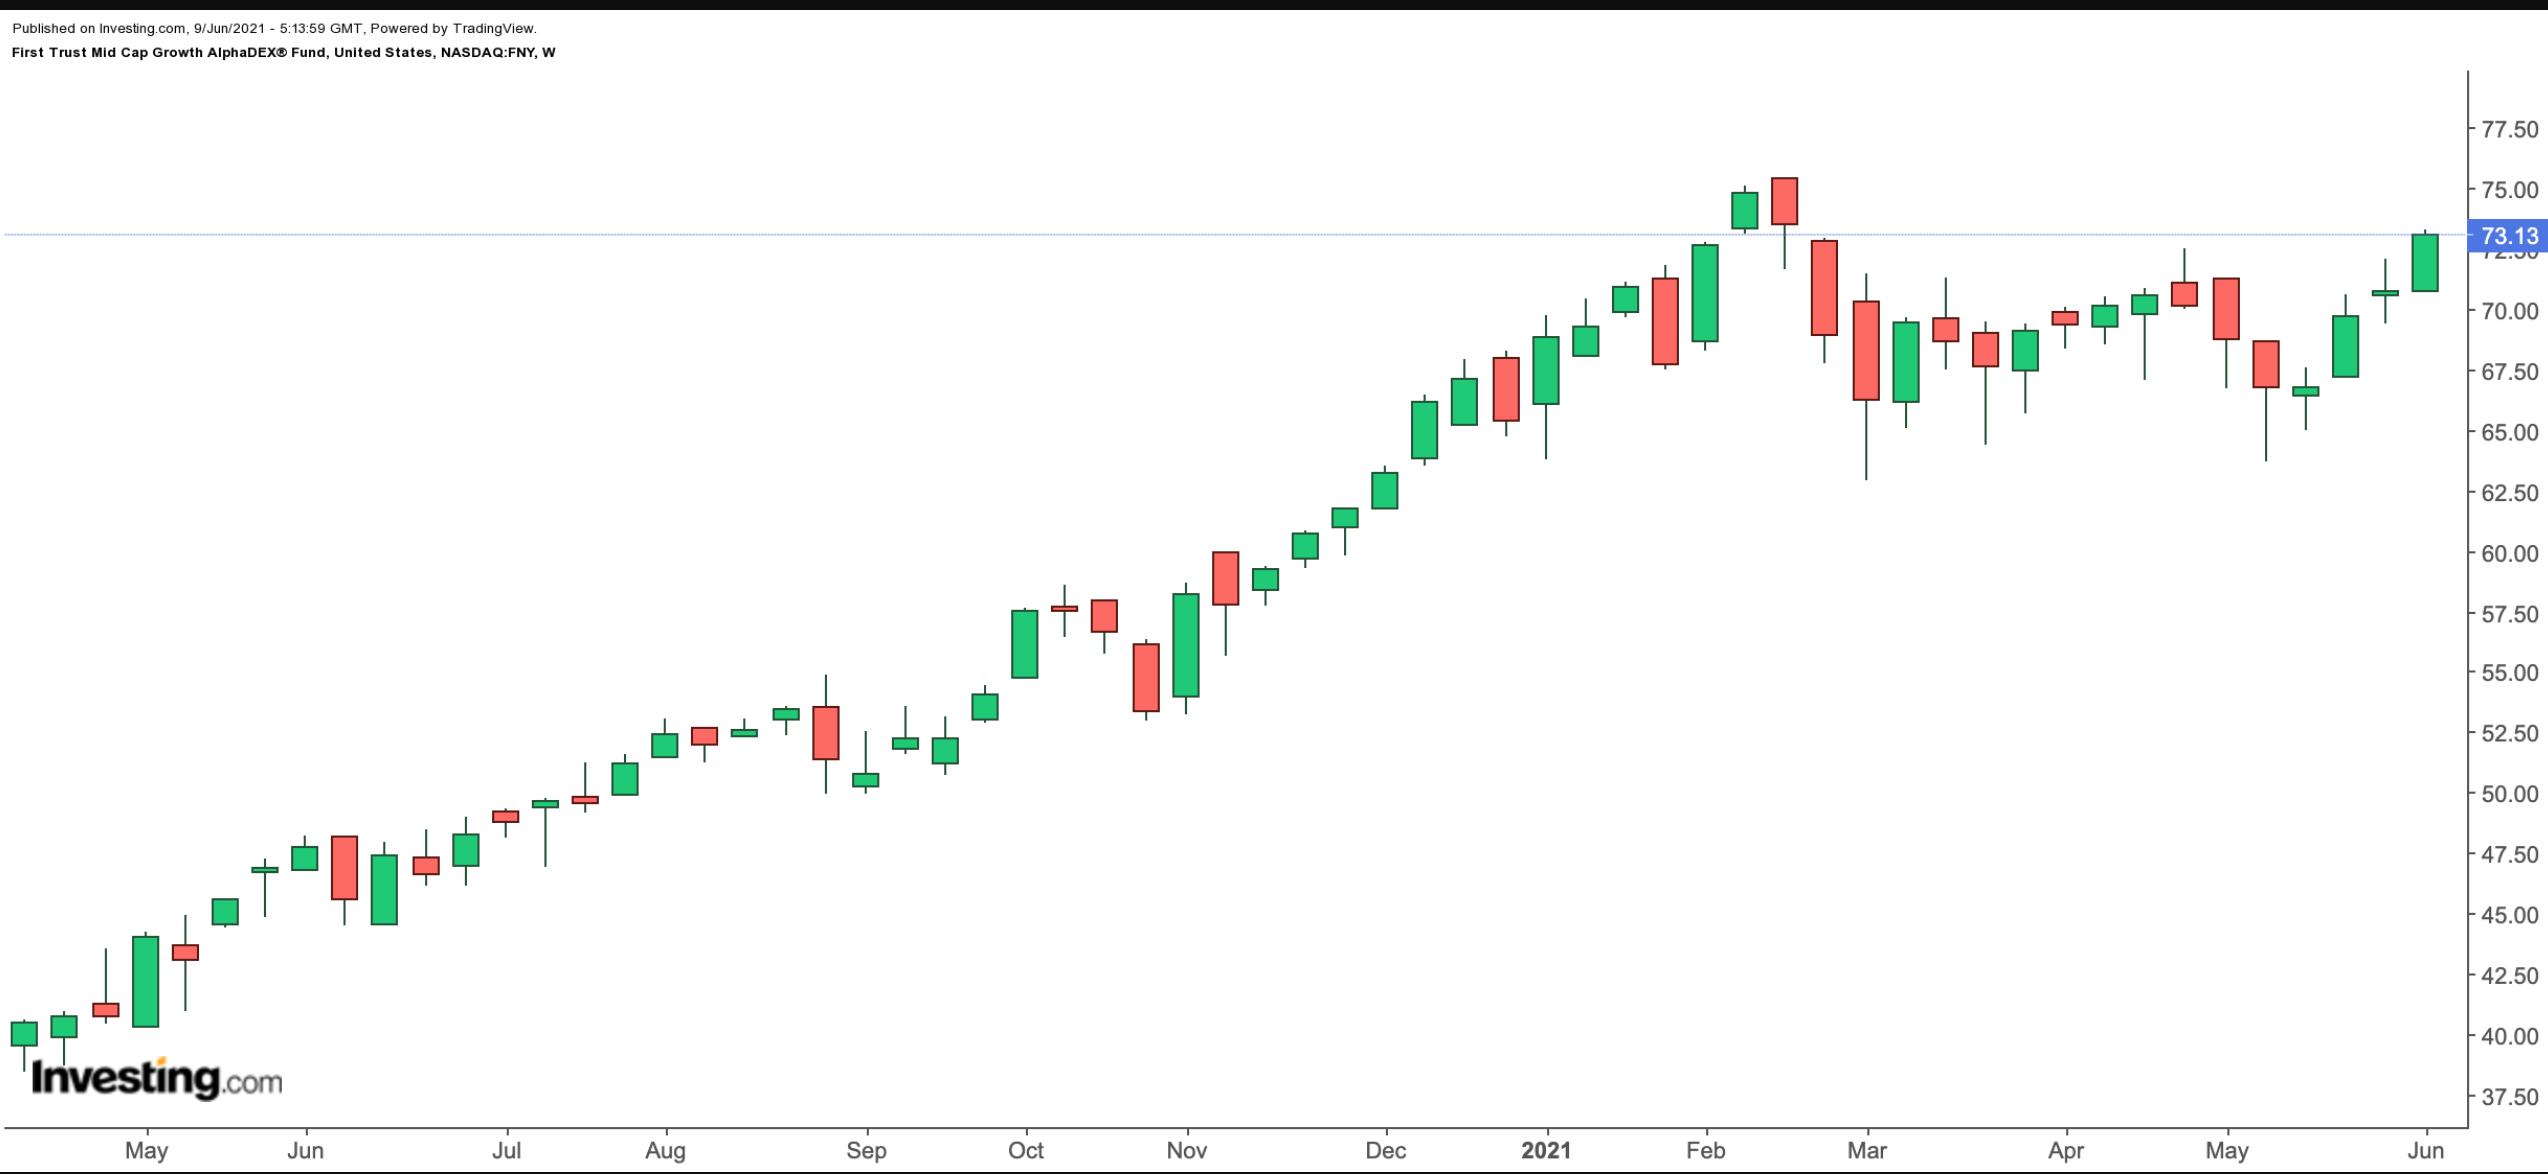 First Trust Mid Cap Growth AlphaDEX® Fund 주간 차트